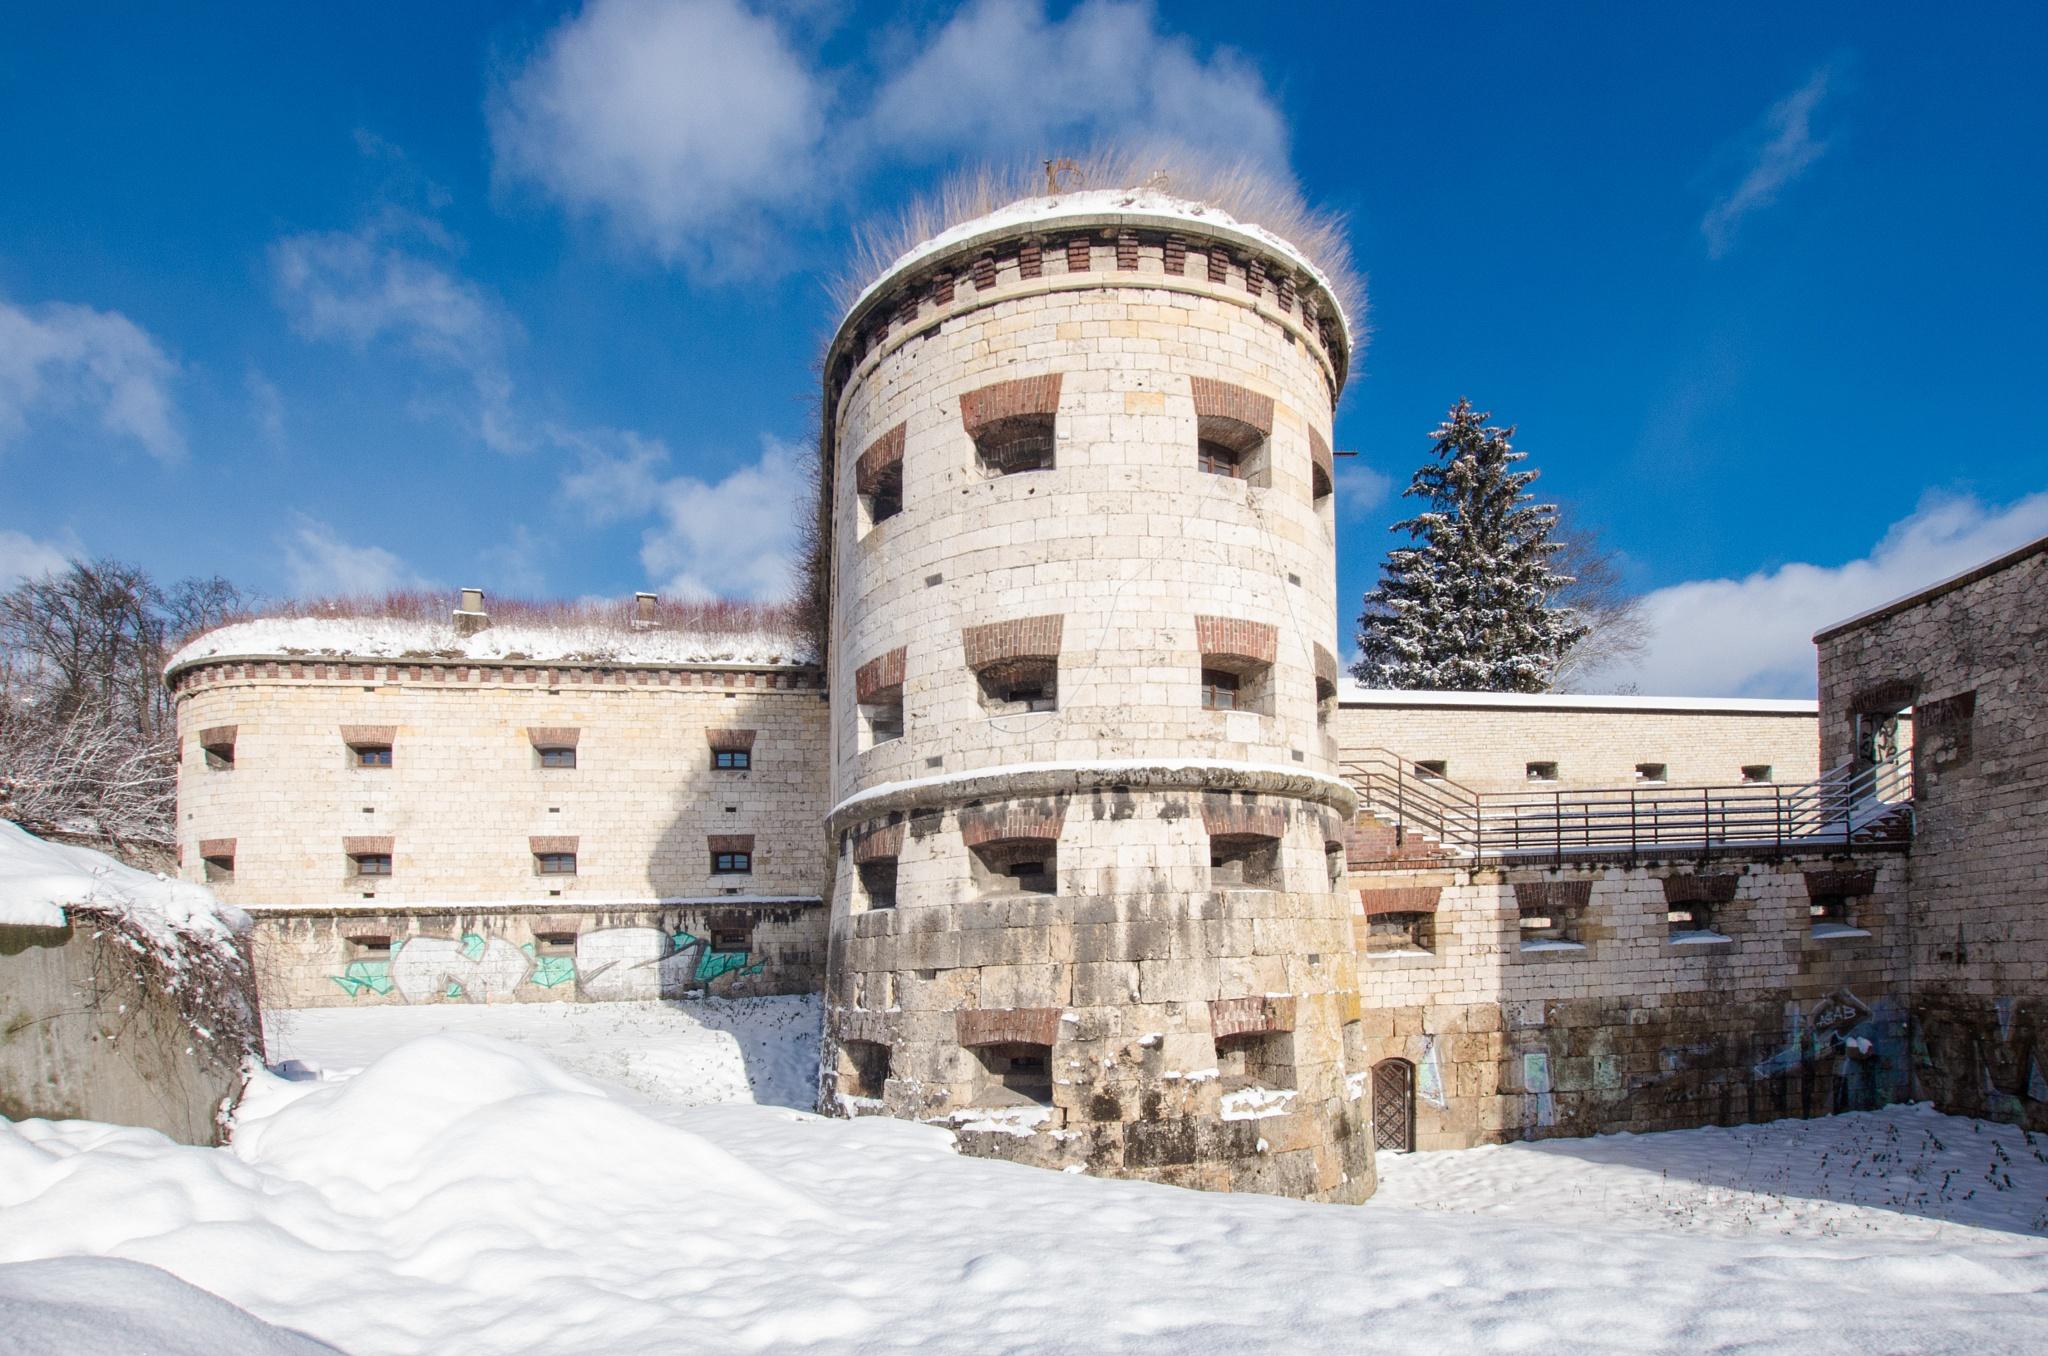 Kienlesberg bastion in winter by Michael Vogt